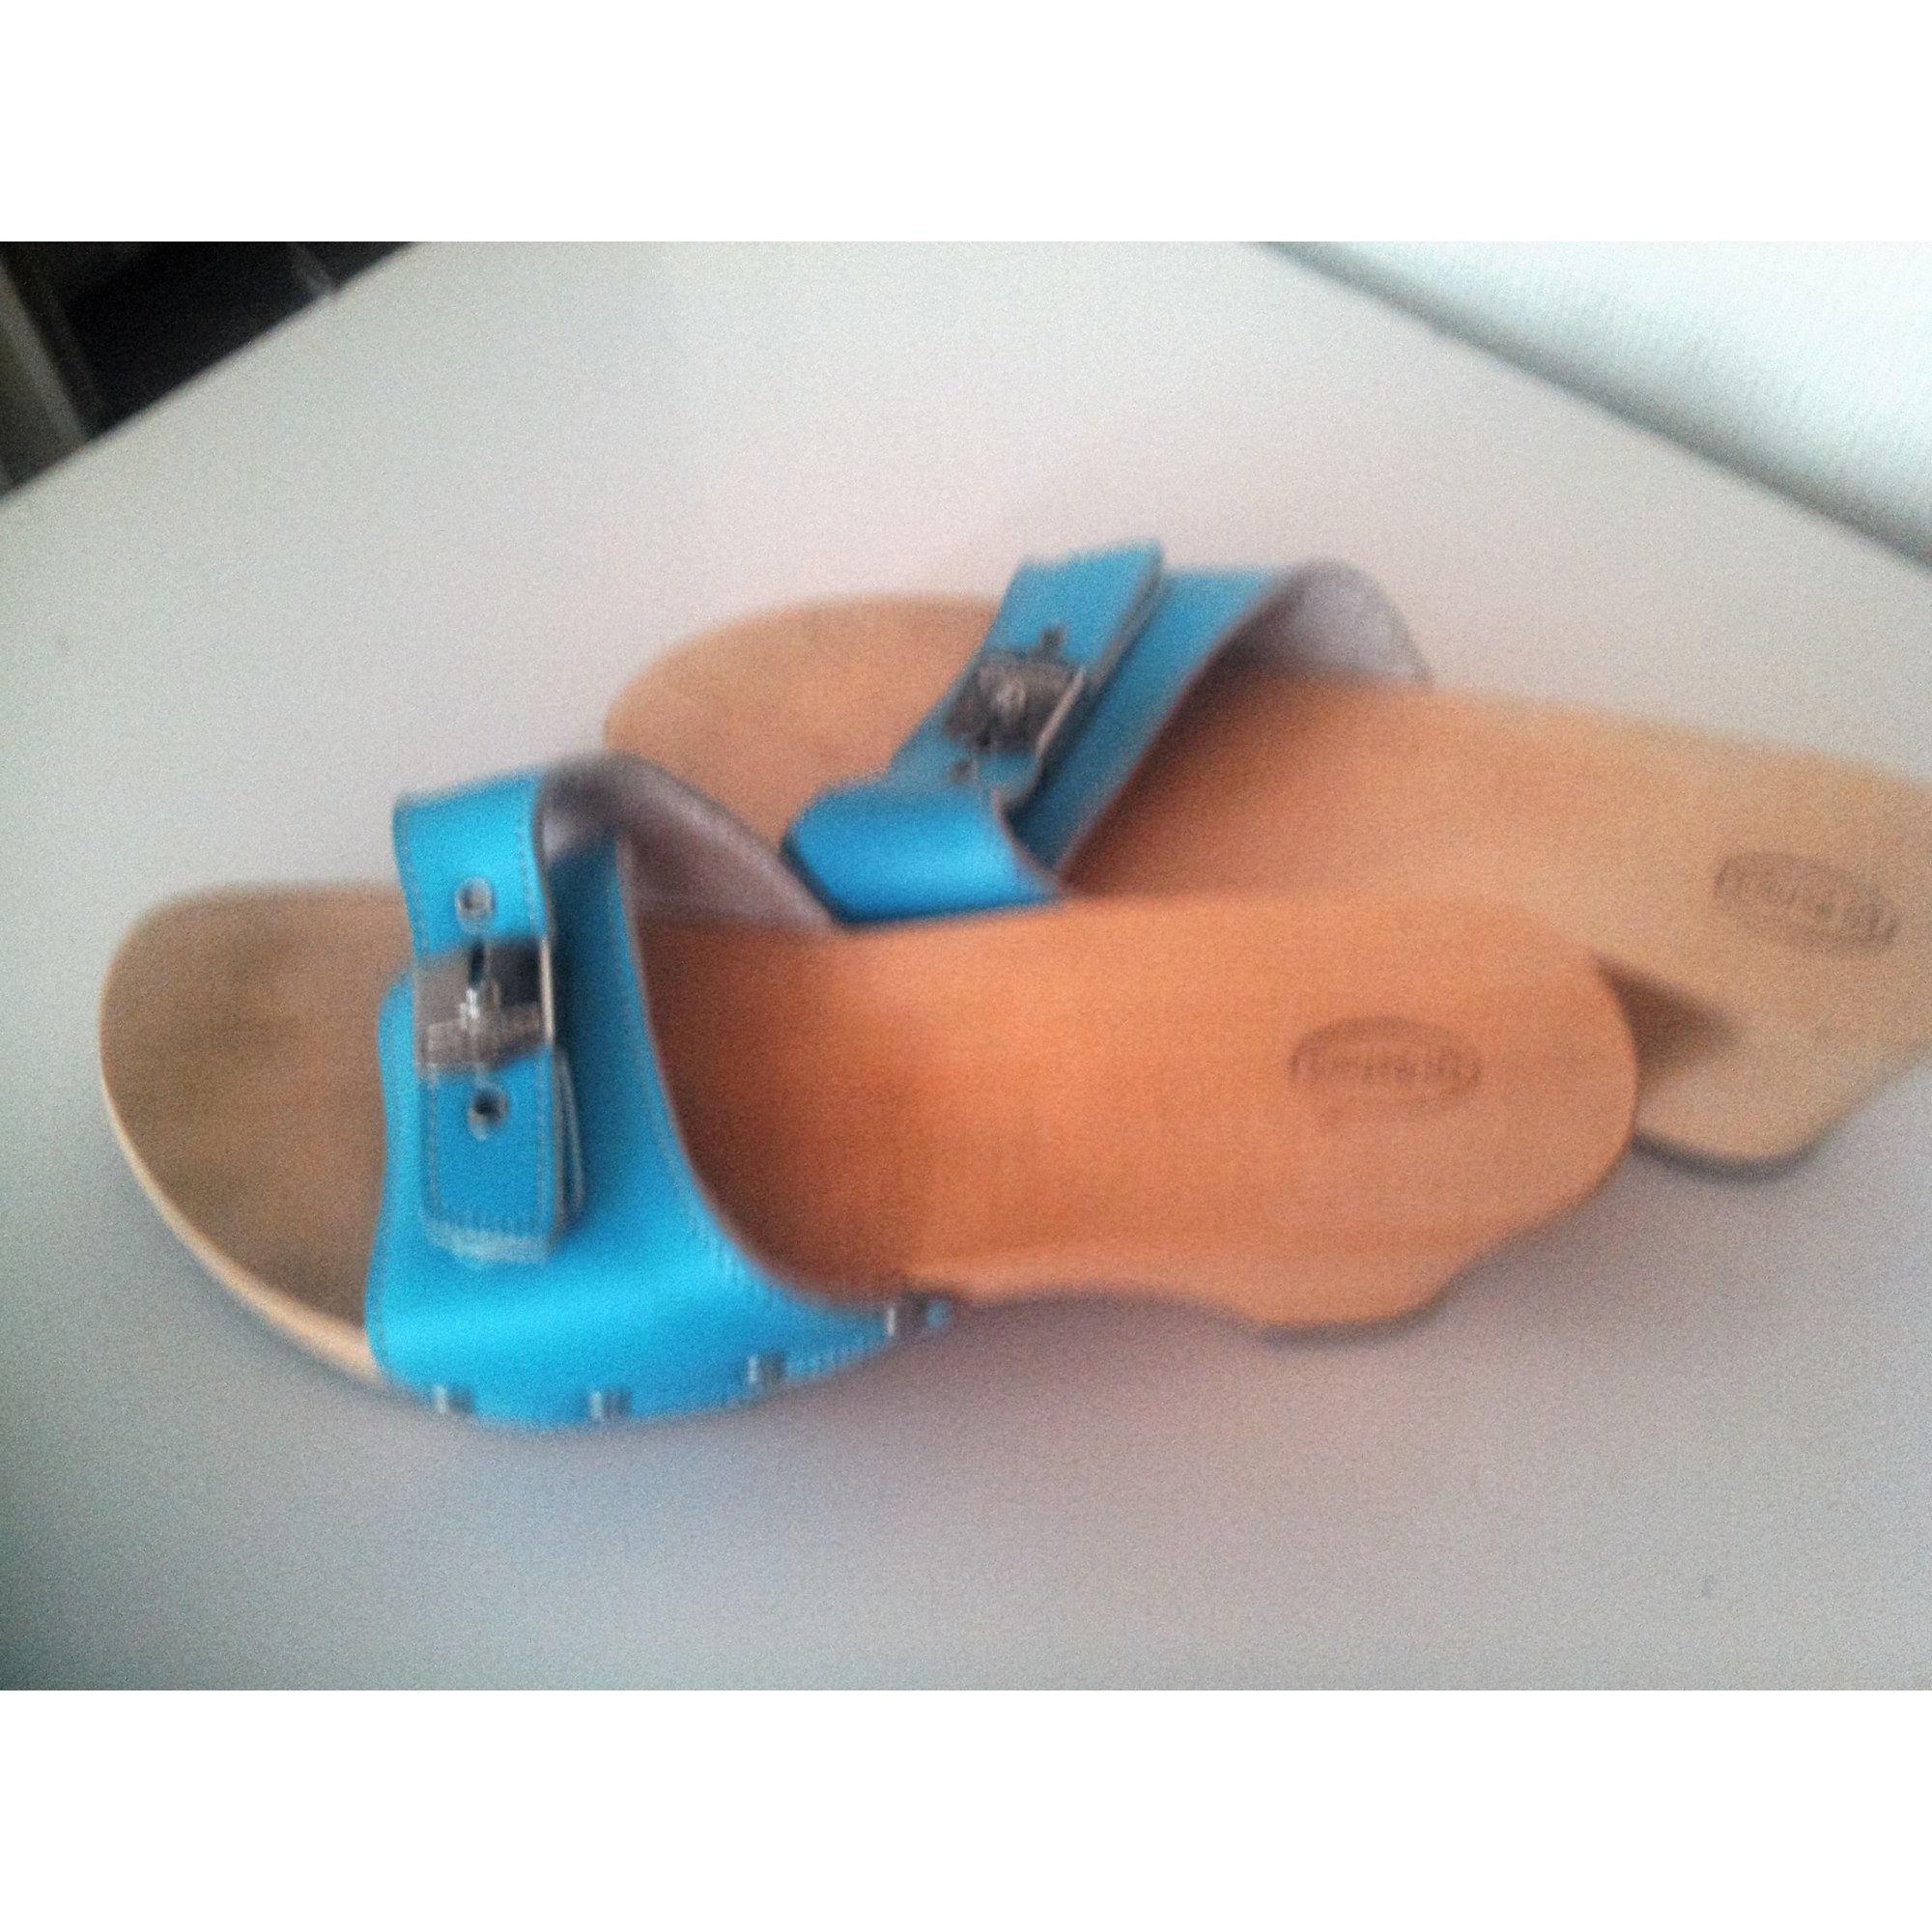 d4c413eb767a84 Sabots SCHOLL 40 bleu vendu par Calliope23290 - 6317364